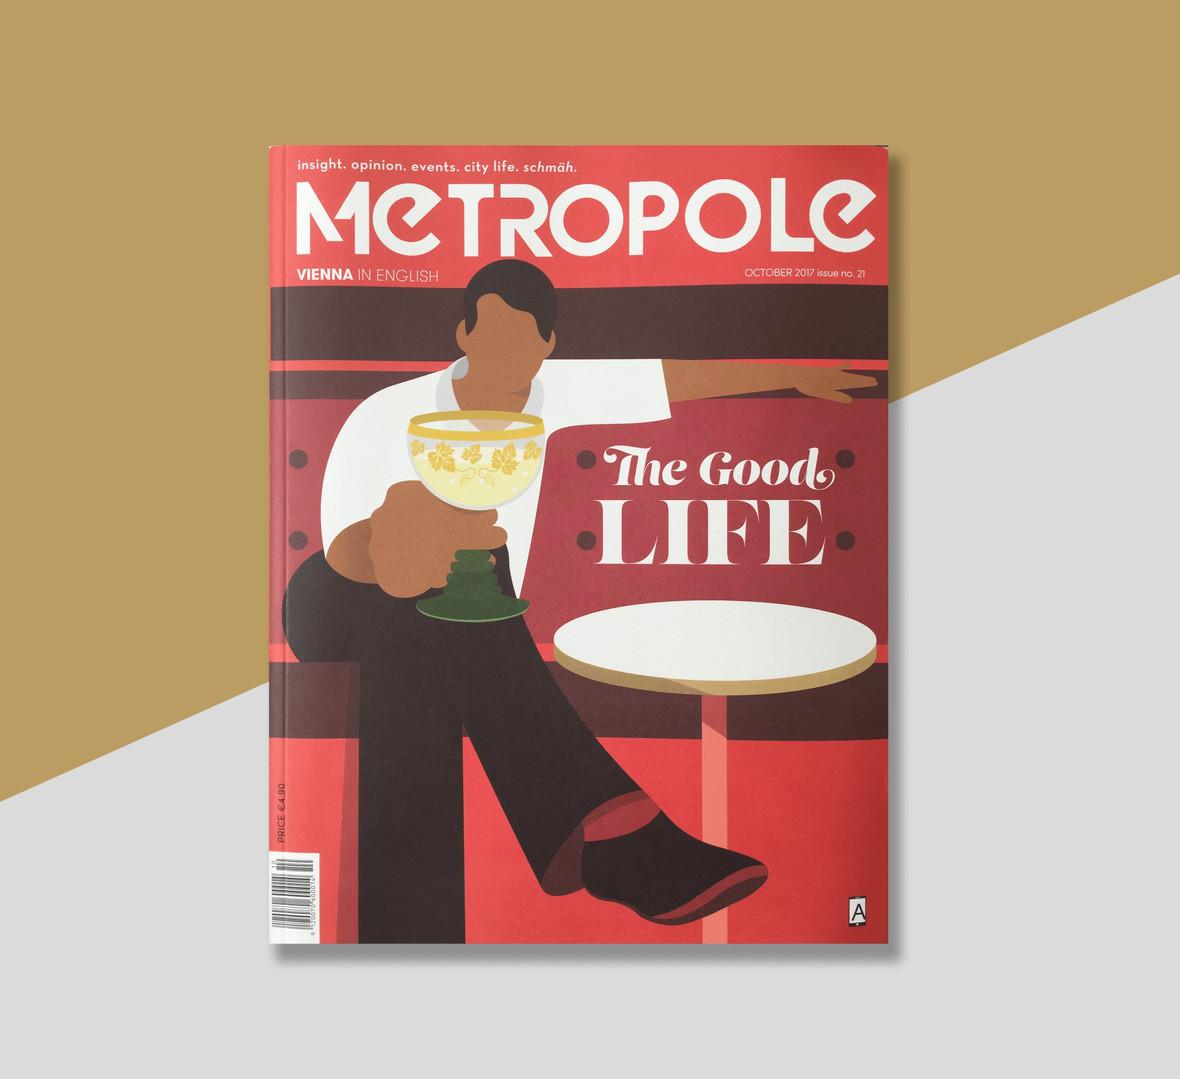 Metropole%20The%20Good%20Life_edited.jpg